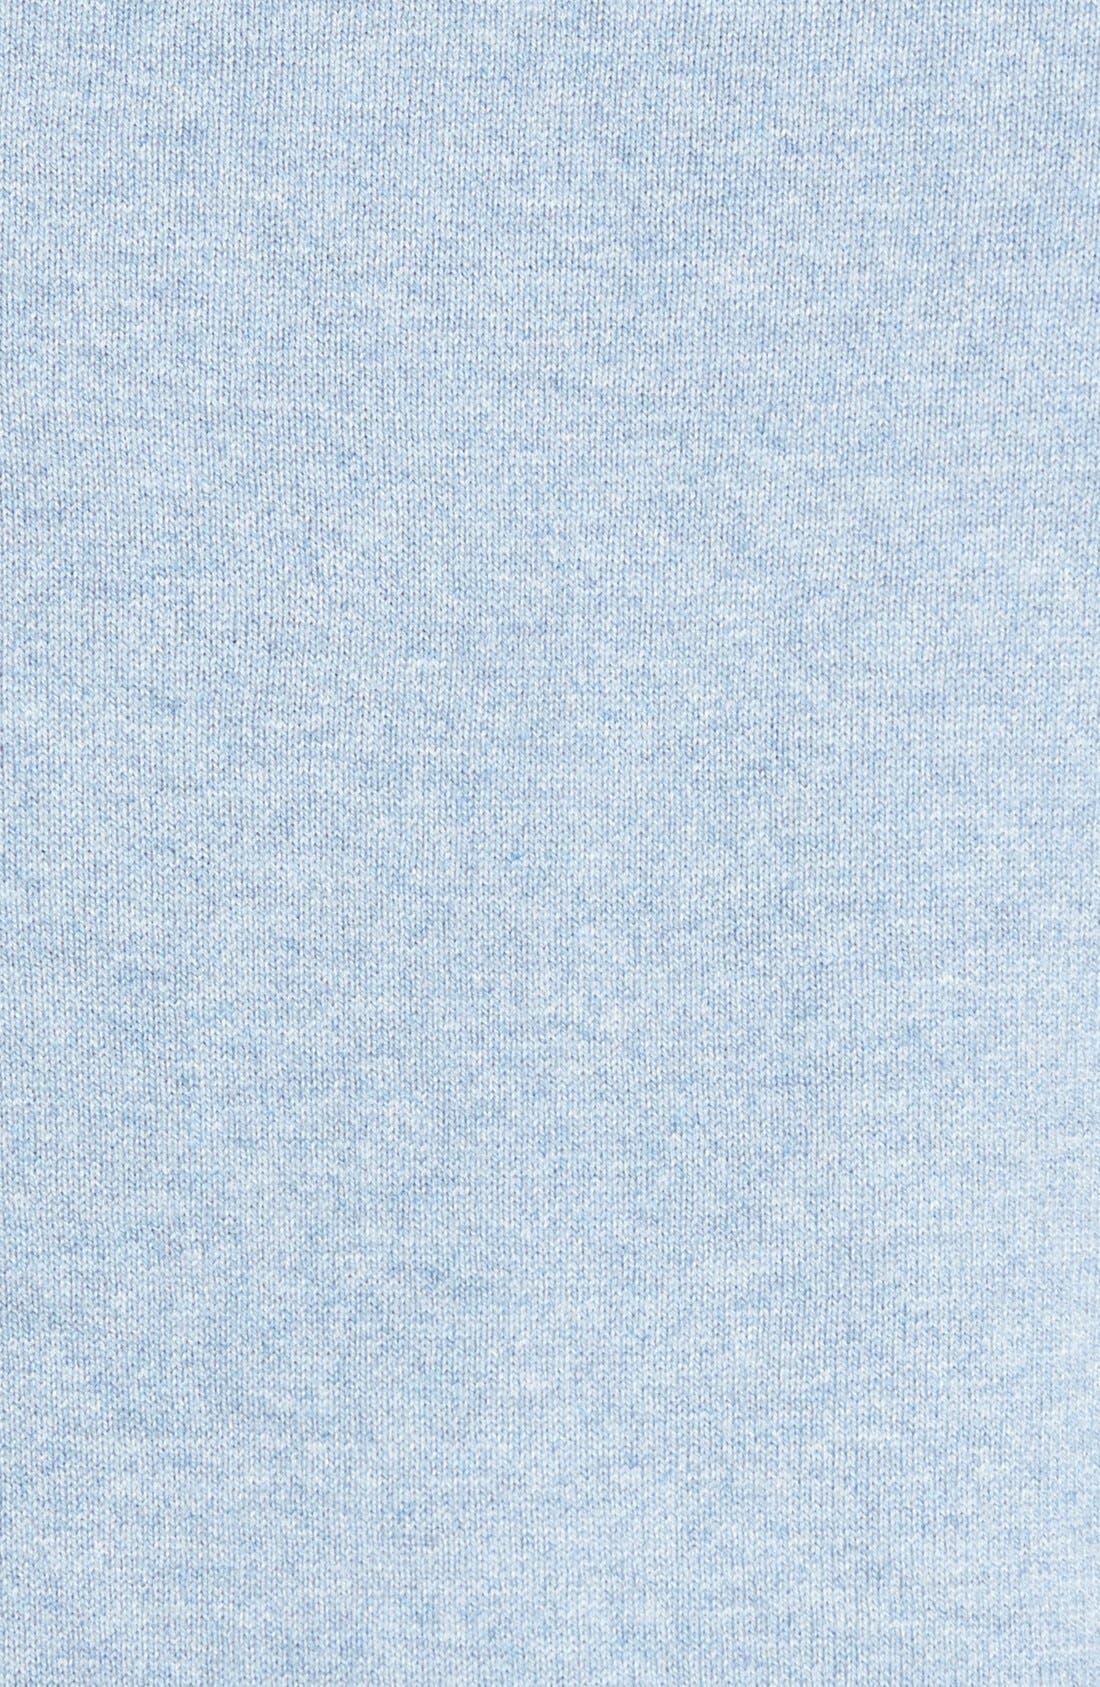 Cotton & Cashmere V-Neck Sweater,                             Alternate thumbnail 3, color,                             Blue Celestial Heather